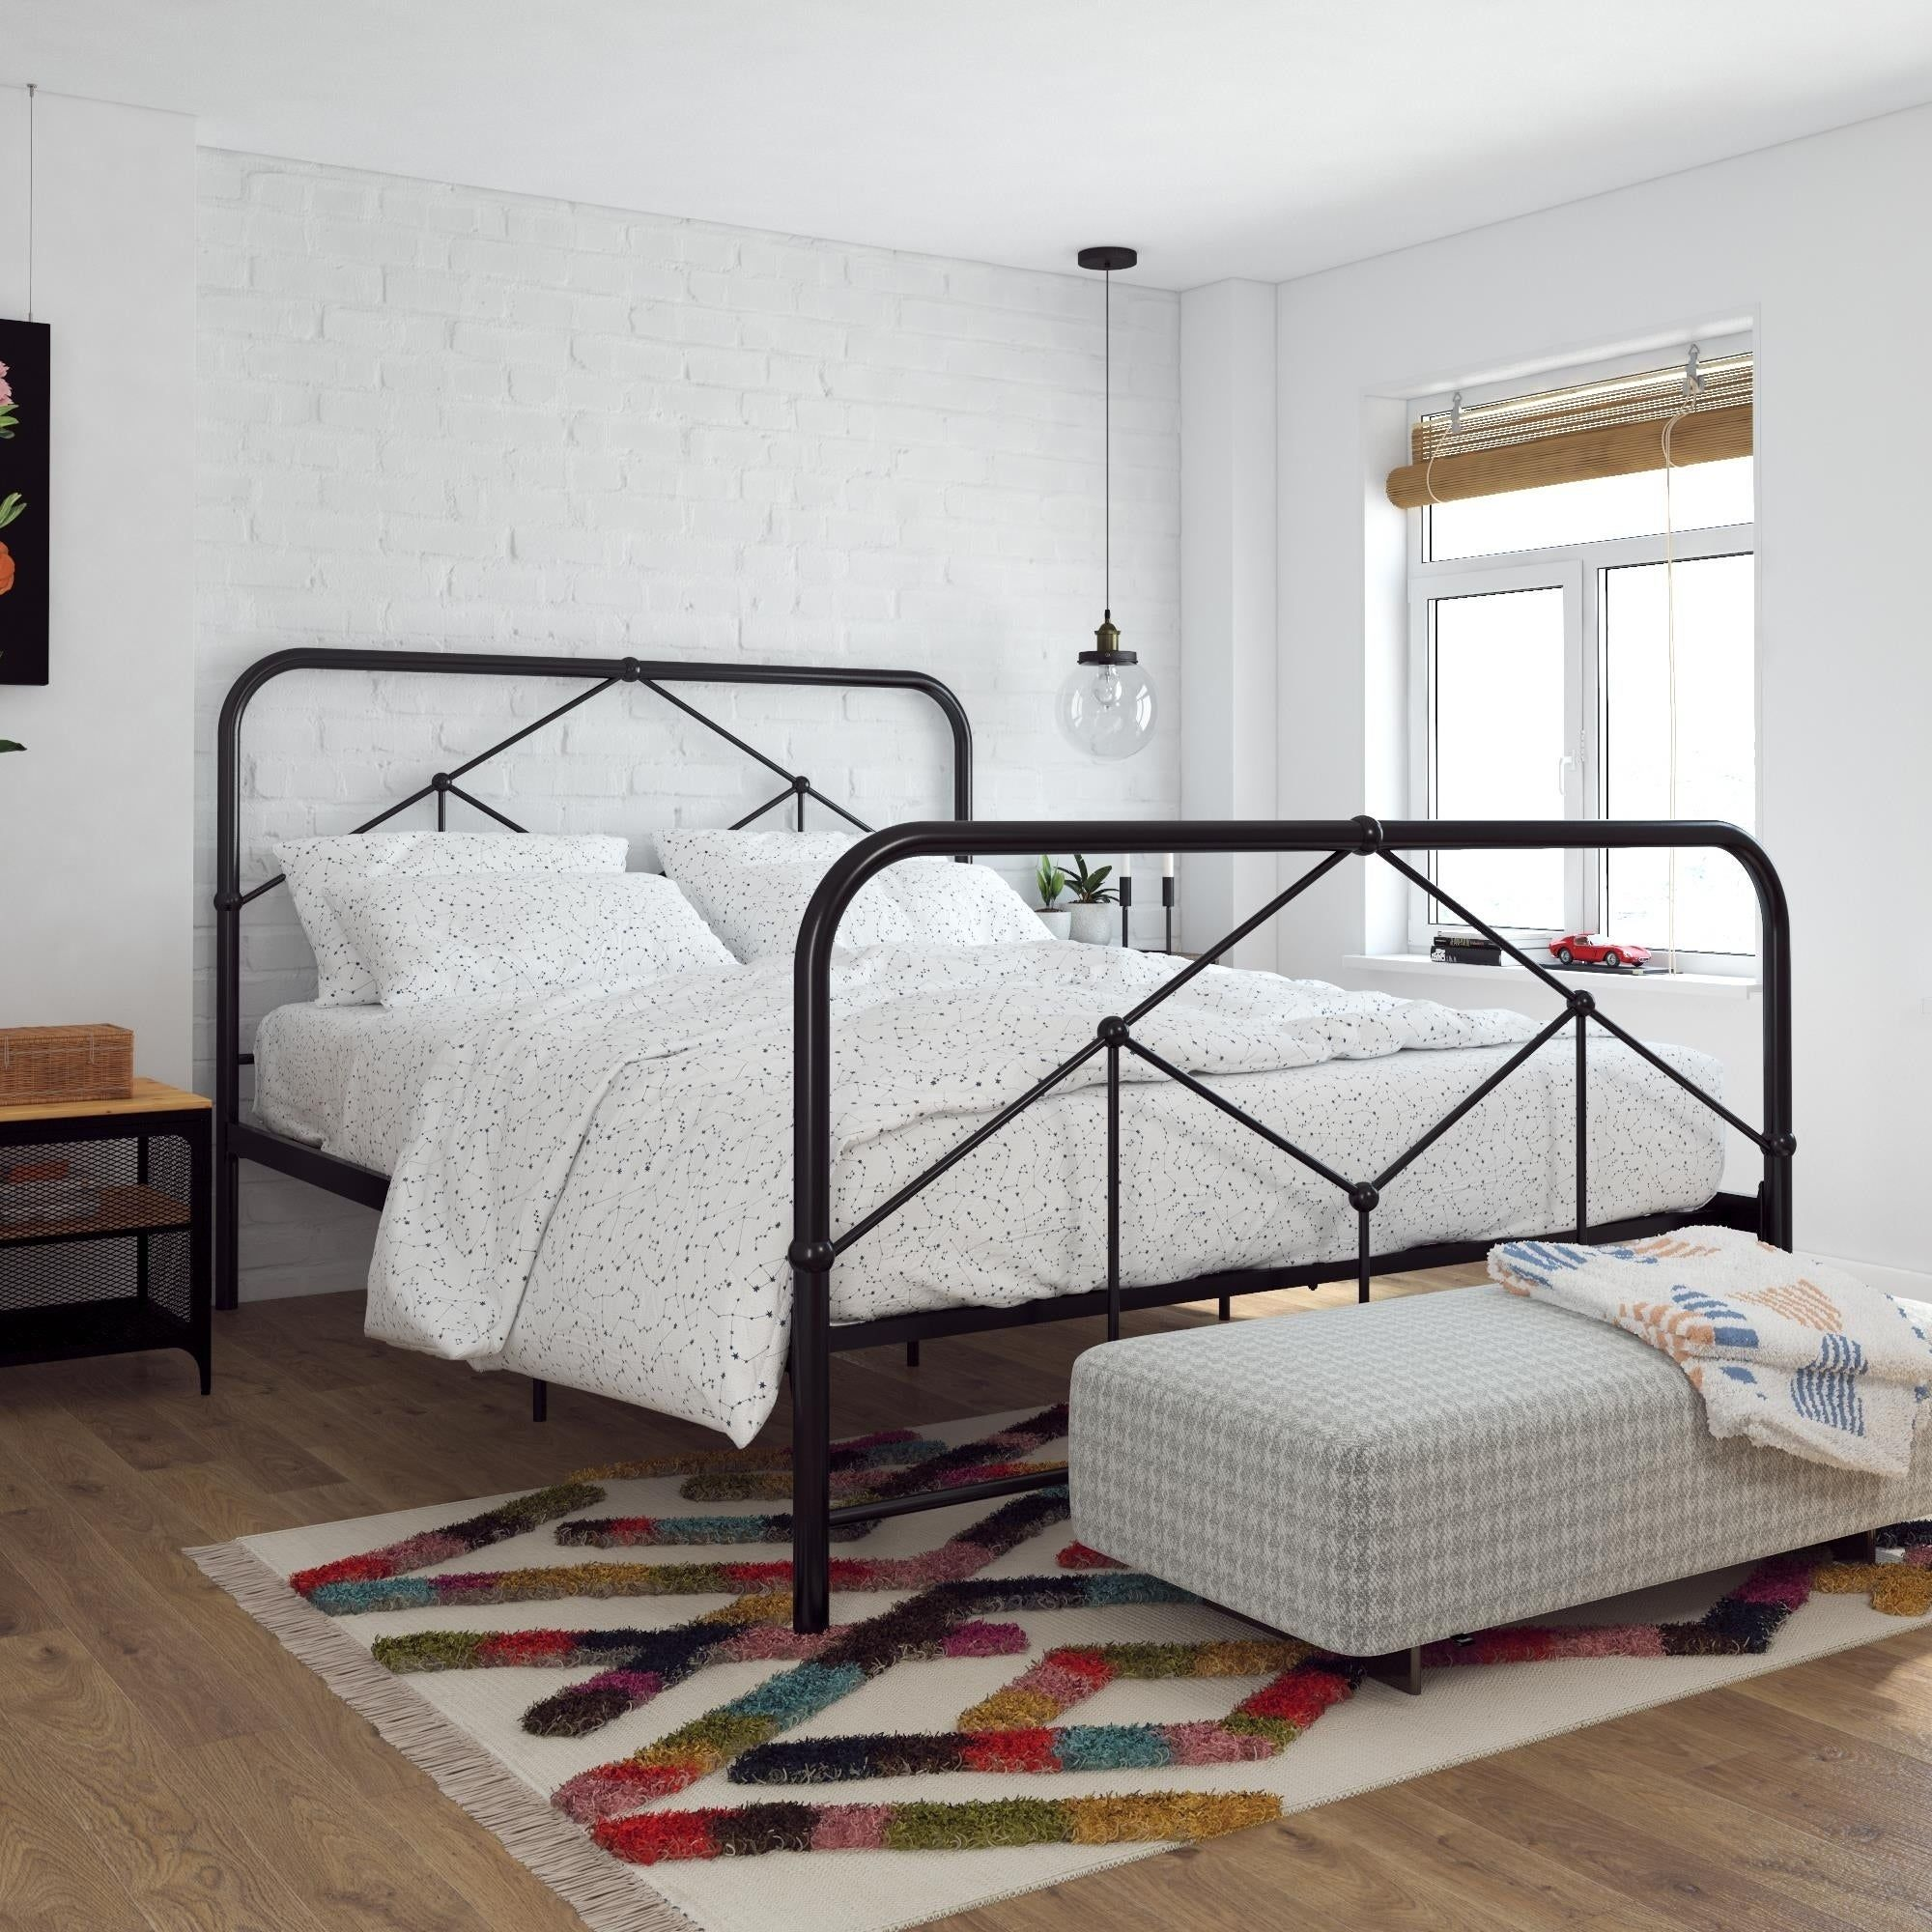 Novogratz Francis Farmhouse Metal Bed With Images Metal Beds Bed Frame Black Metal Bed Frame